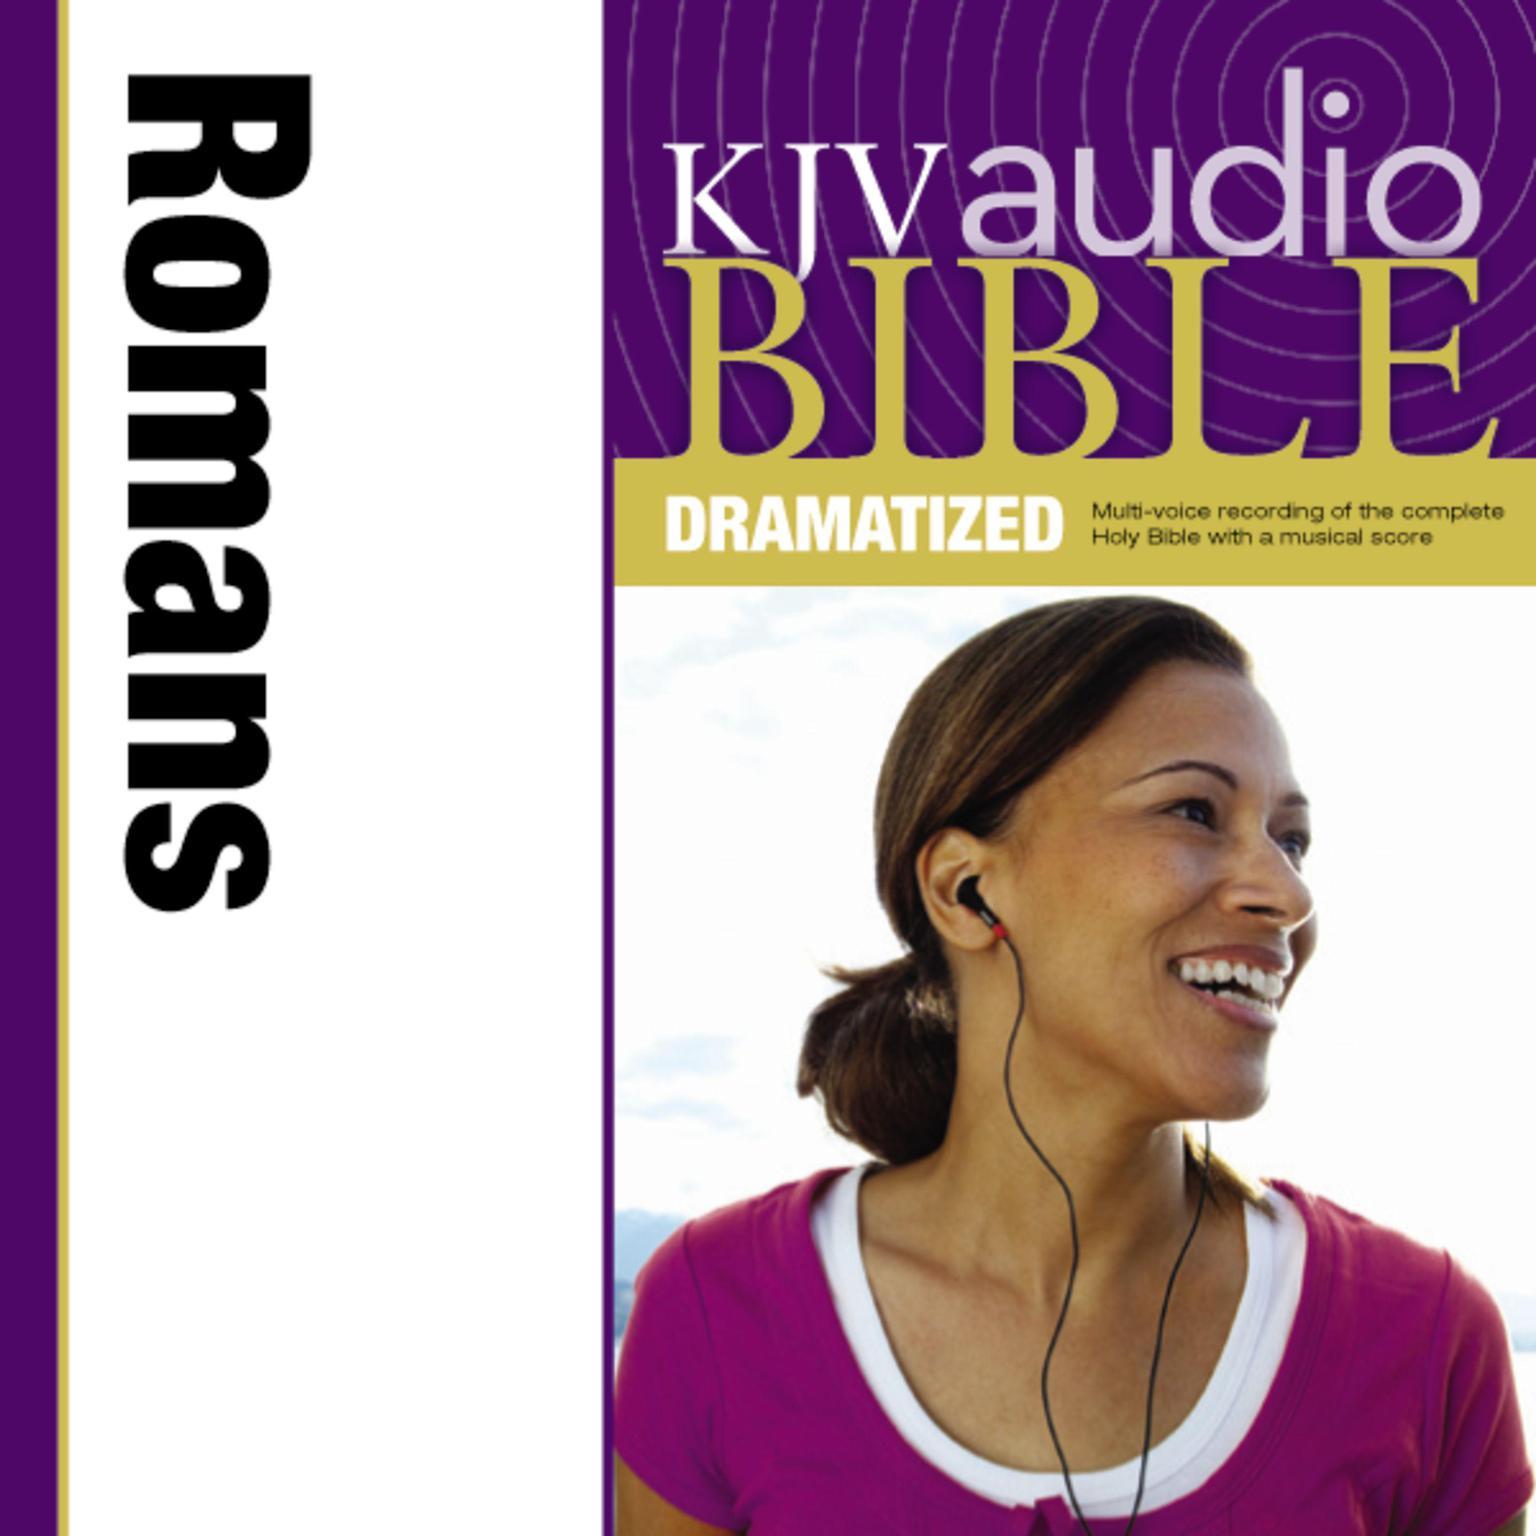 Printable KJV, Audio Bible, Dramatized: Romans, Audio Download Audiobook Cover Art